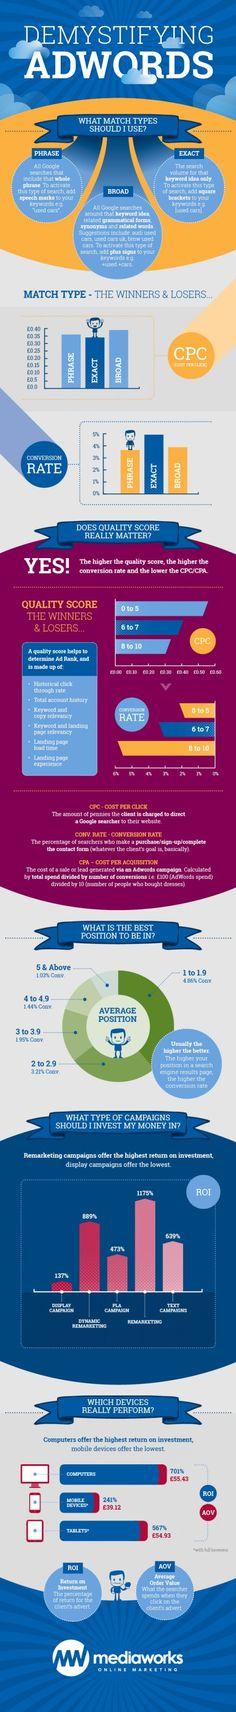 Infografica: l'essenza di Google AdWords - Digital-coach.it